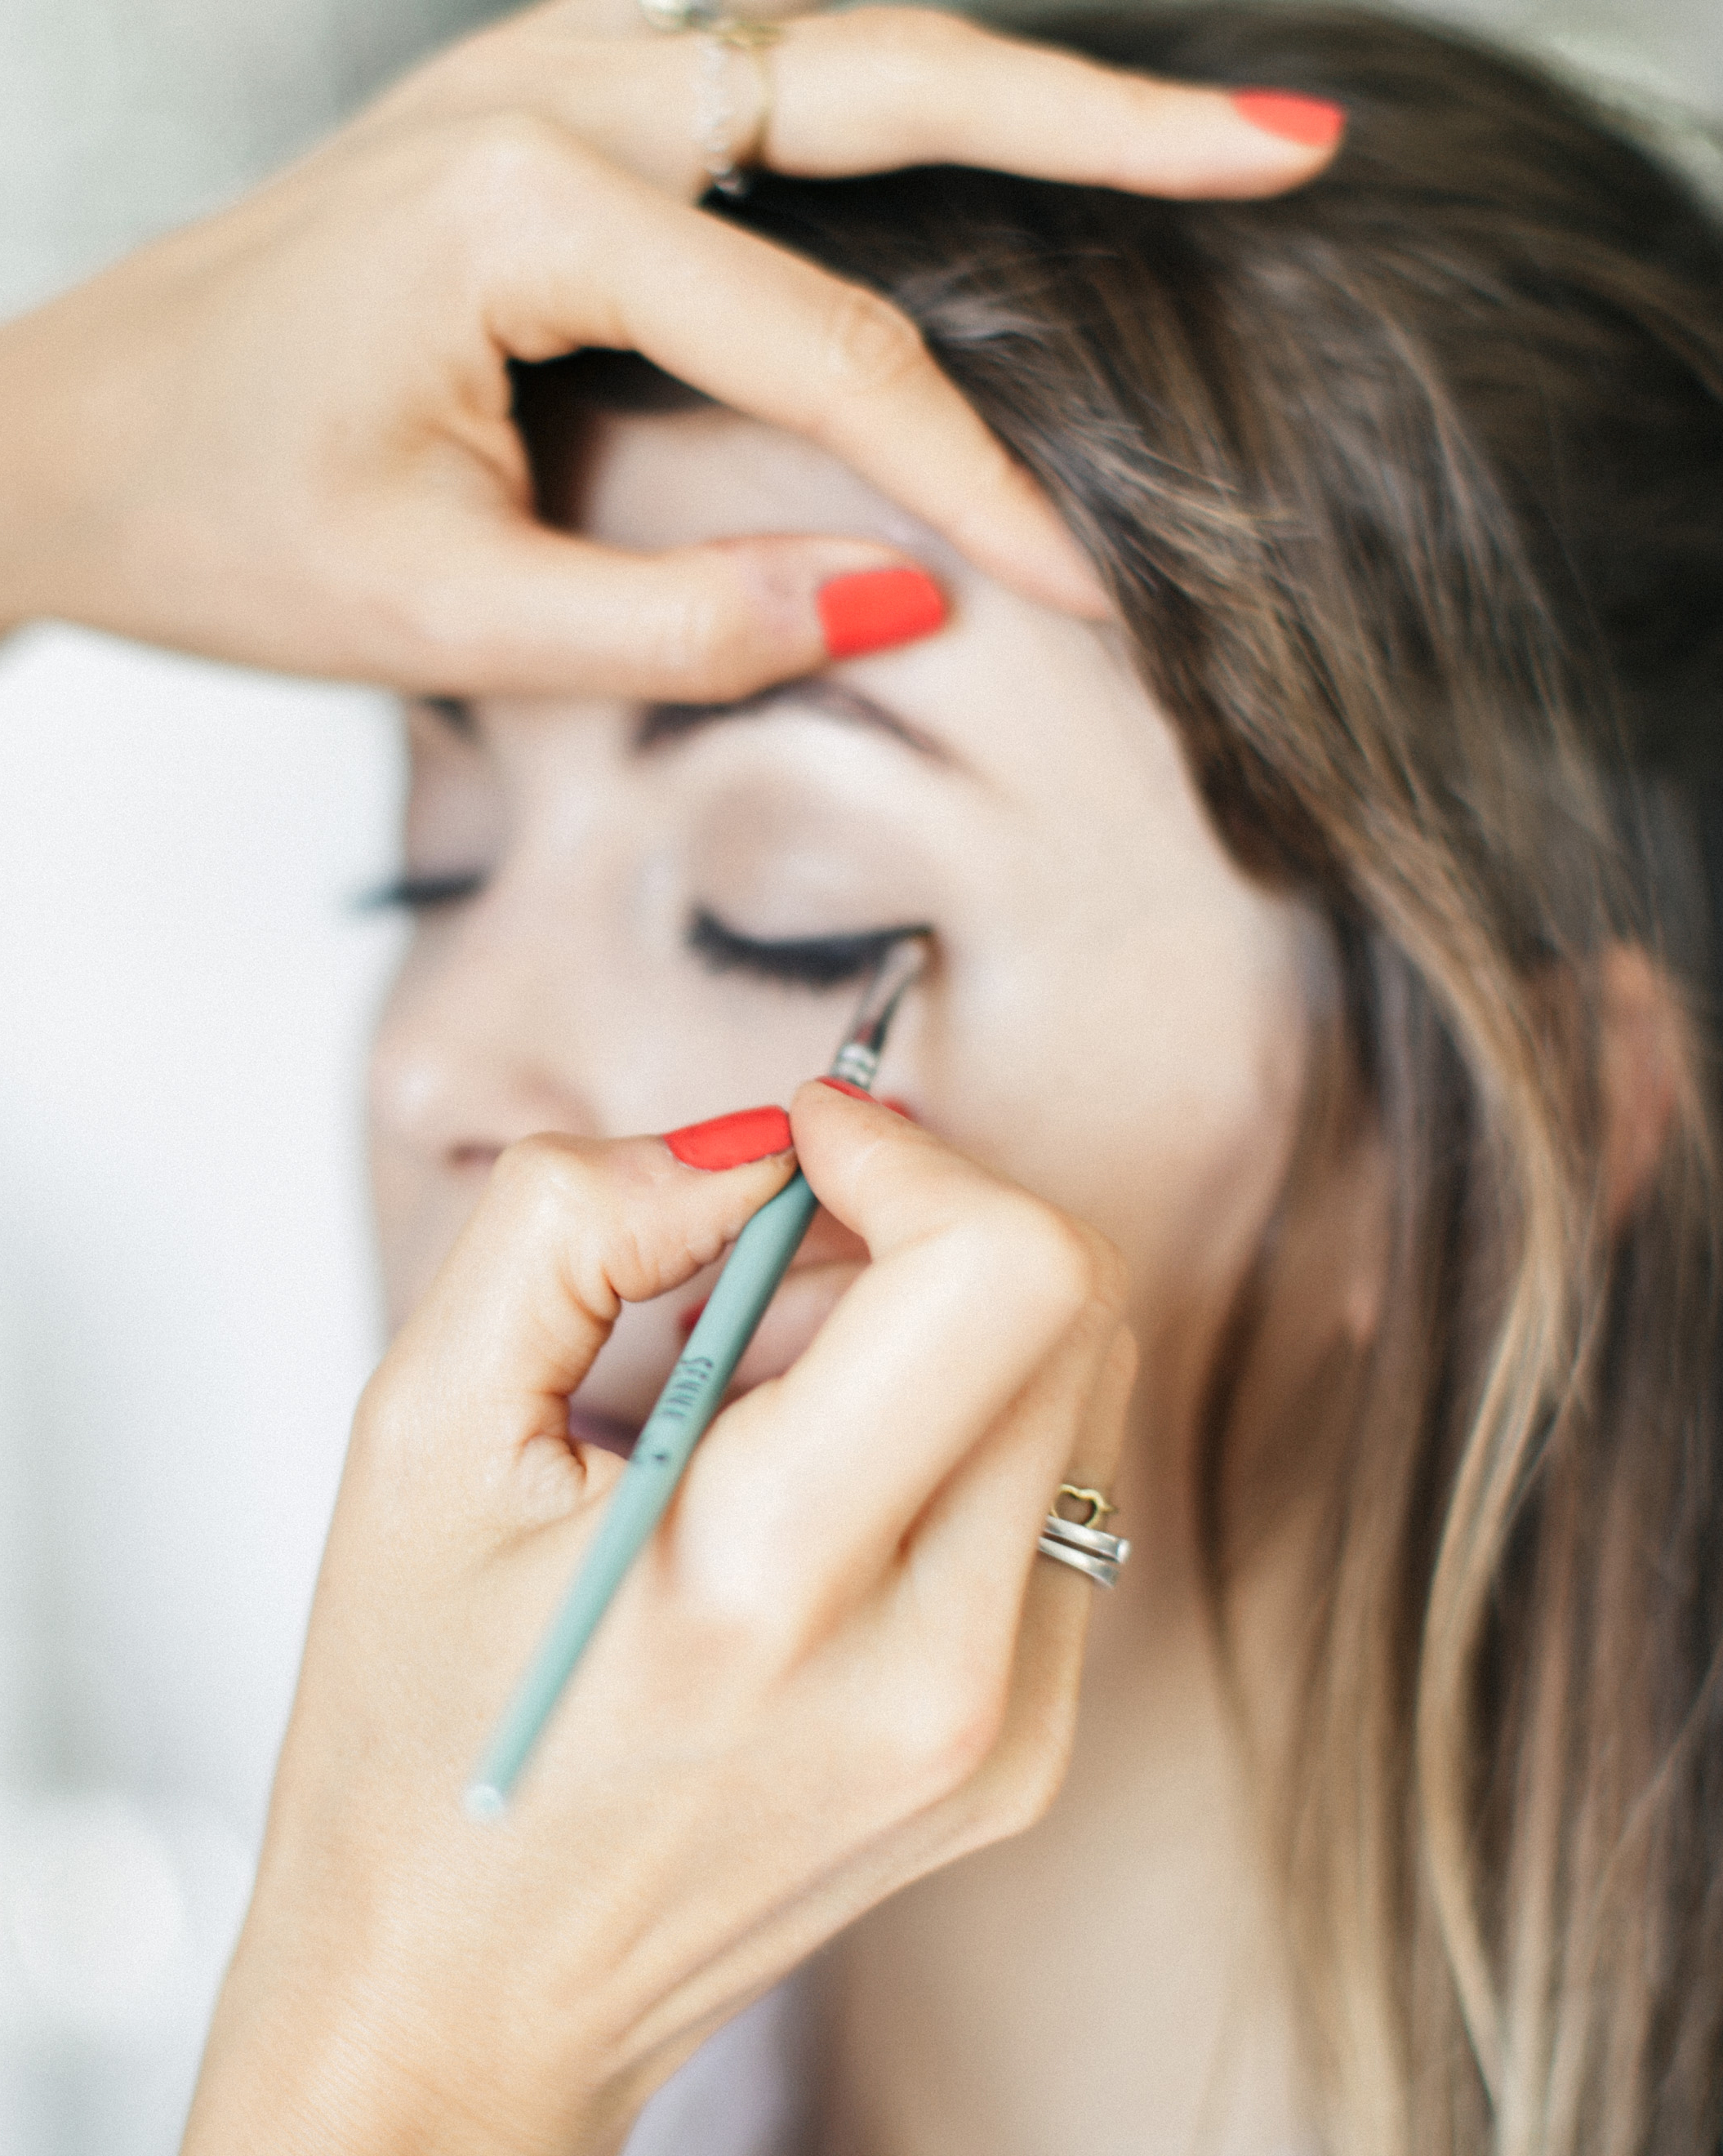 jenny-bernheim-beauty-makeup-72-s112662-1015.jpg